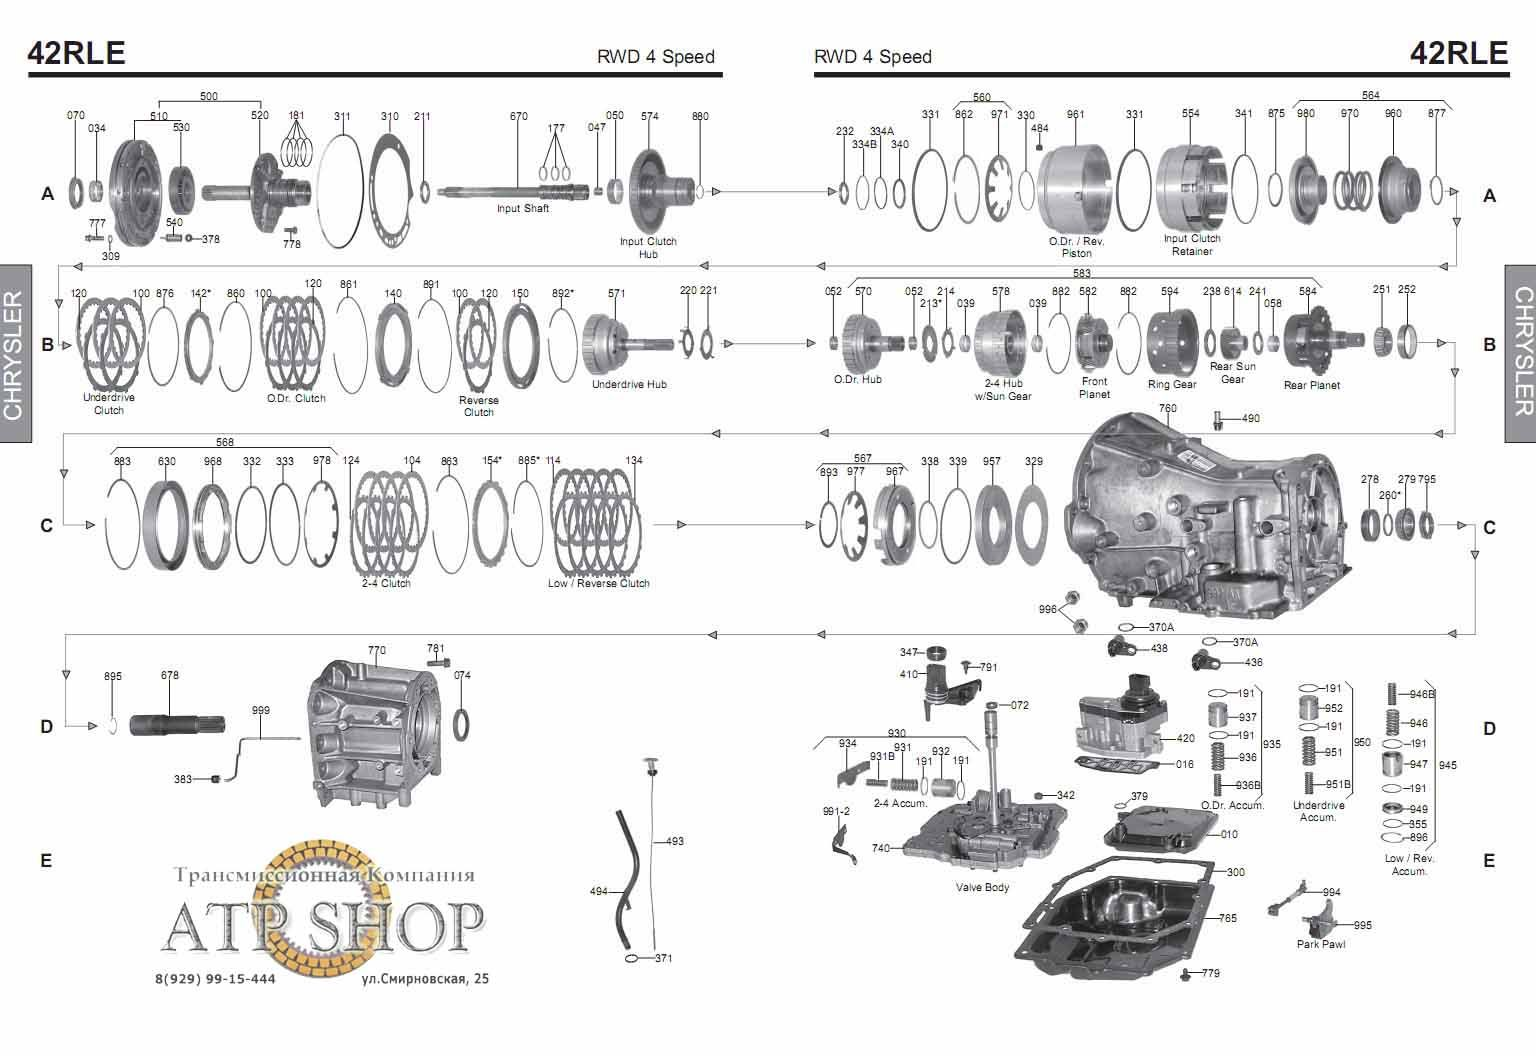 medium resolution of jeep 42rle transmission diagrams wiring diagram expert 42rle transmission wiring diagram 42rle transmission diagram